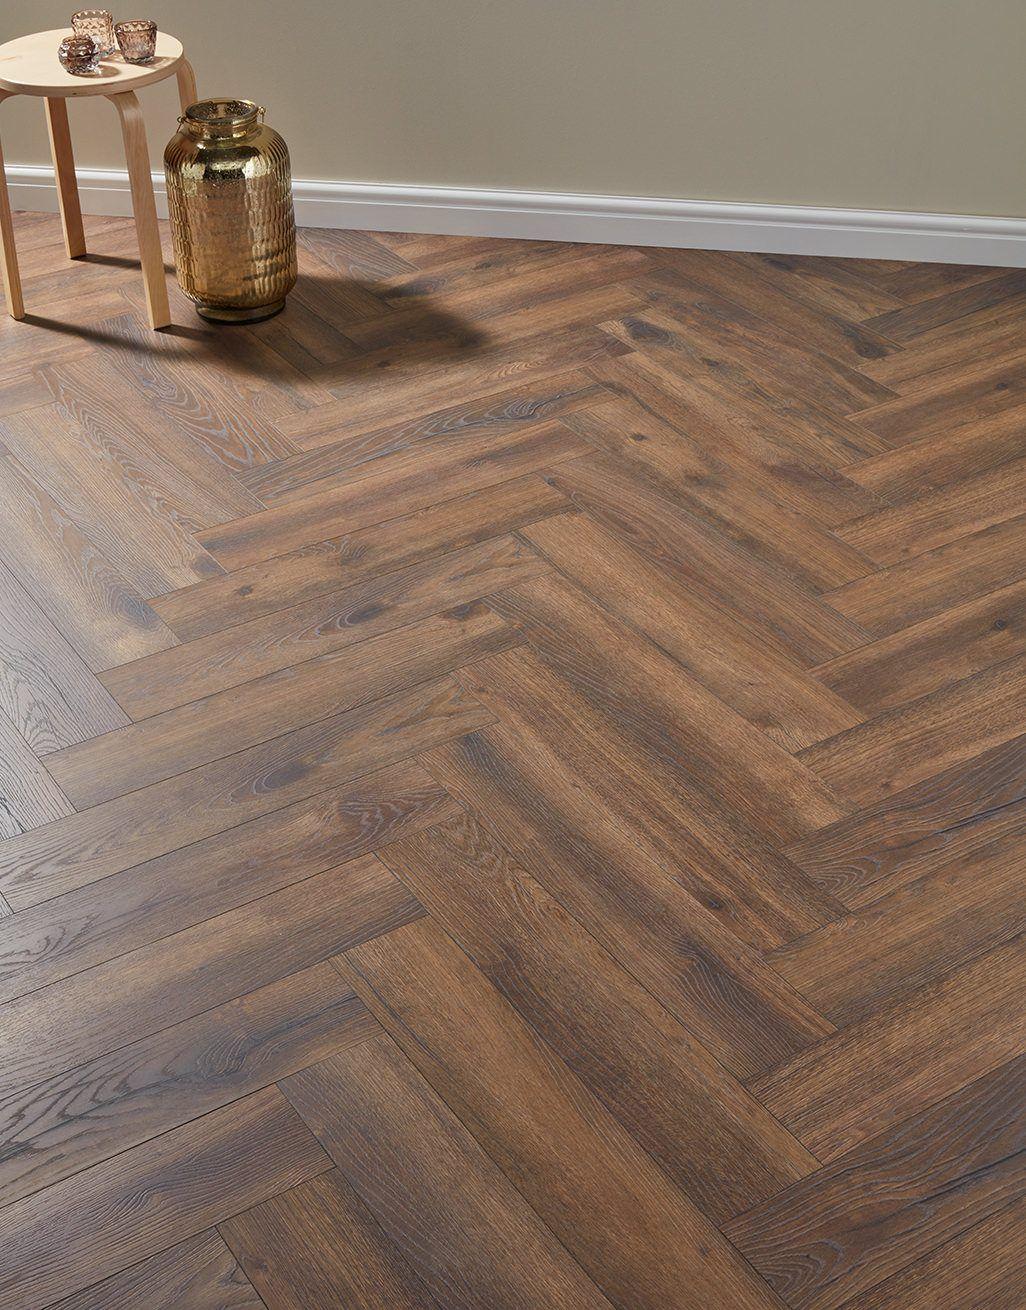 Espresso Oak Laminate Flooring, Herringbone Laminate Flooring